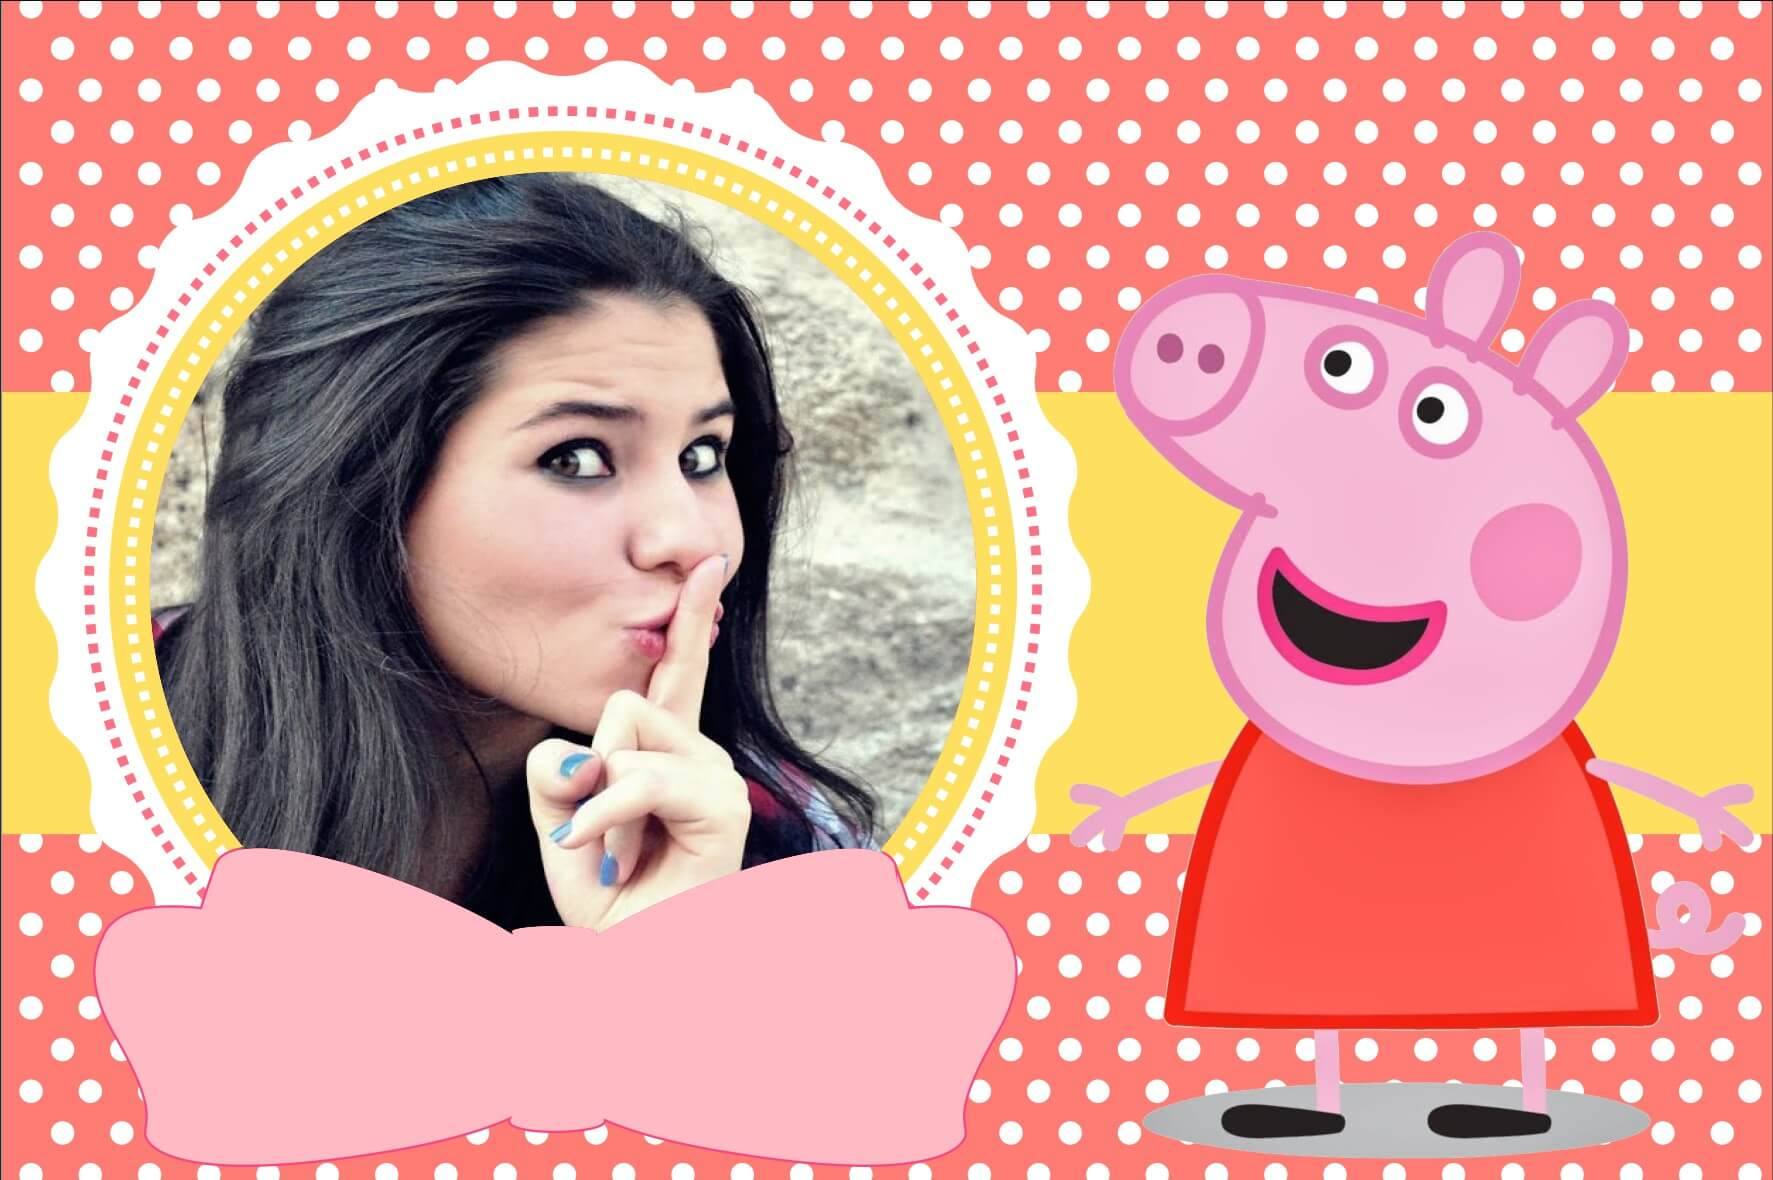 convite-peppa-pig-fotomontagem-online